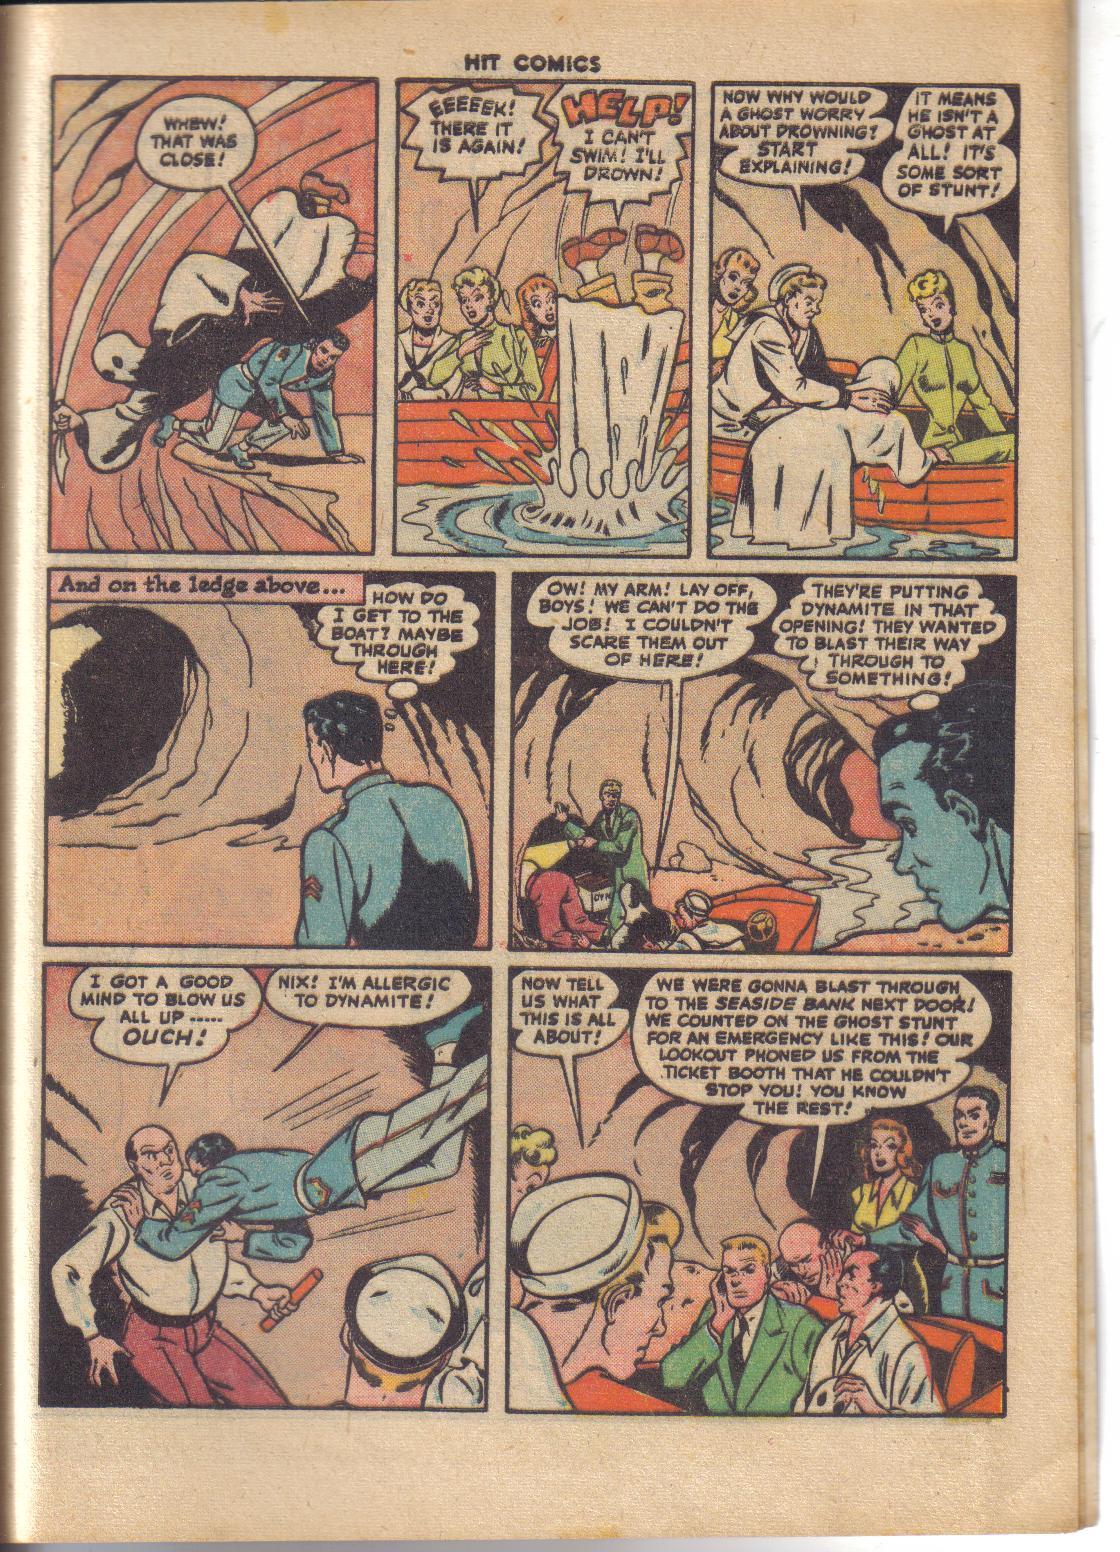 Read online Hit Comics comic -  Issue #45 - 22